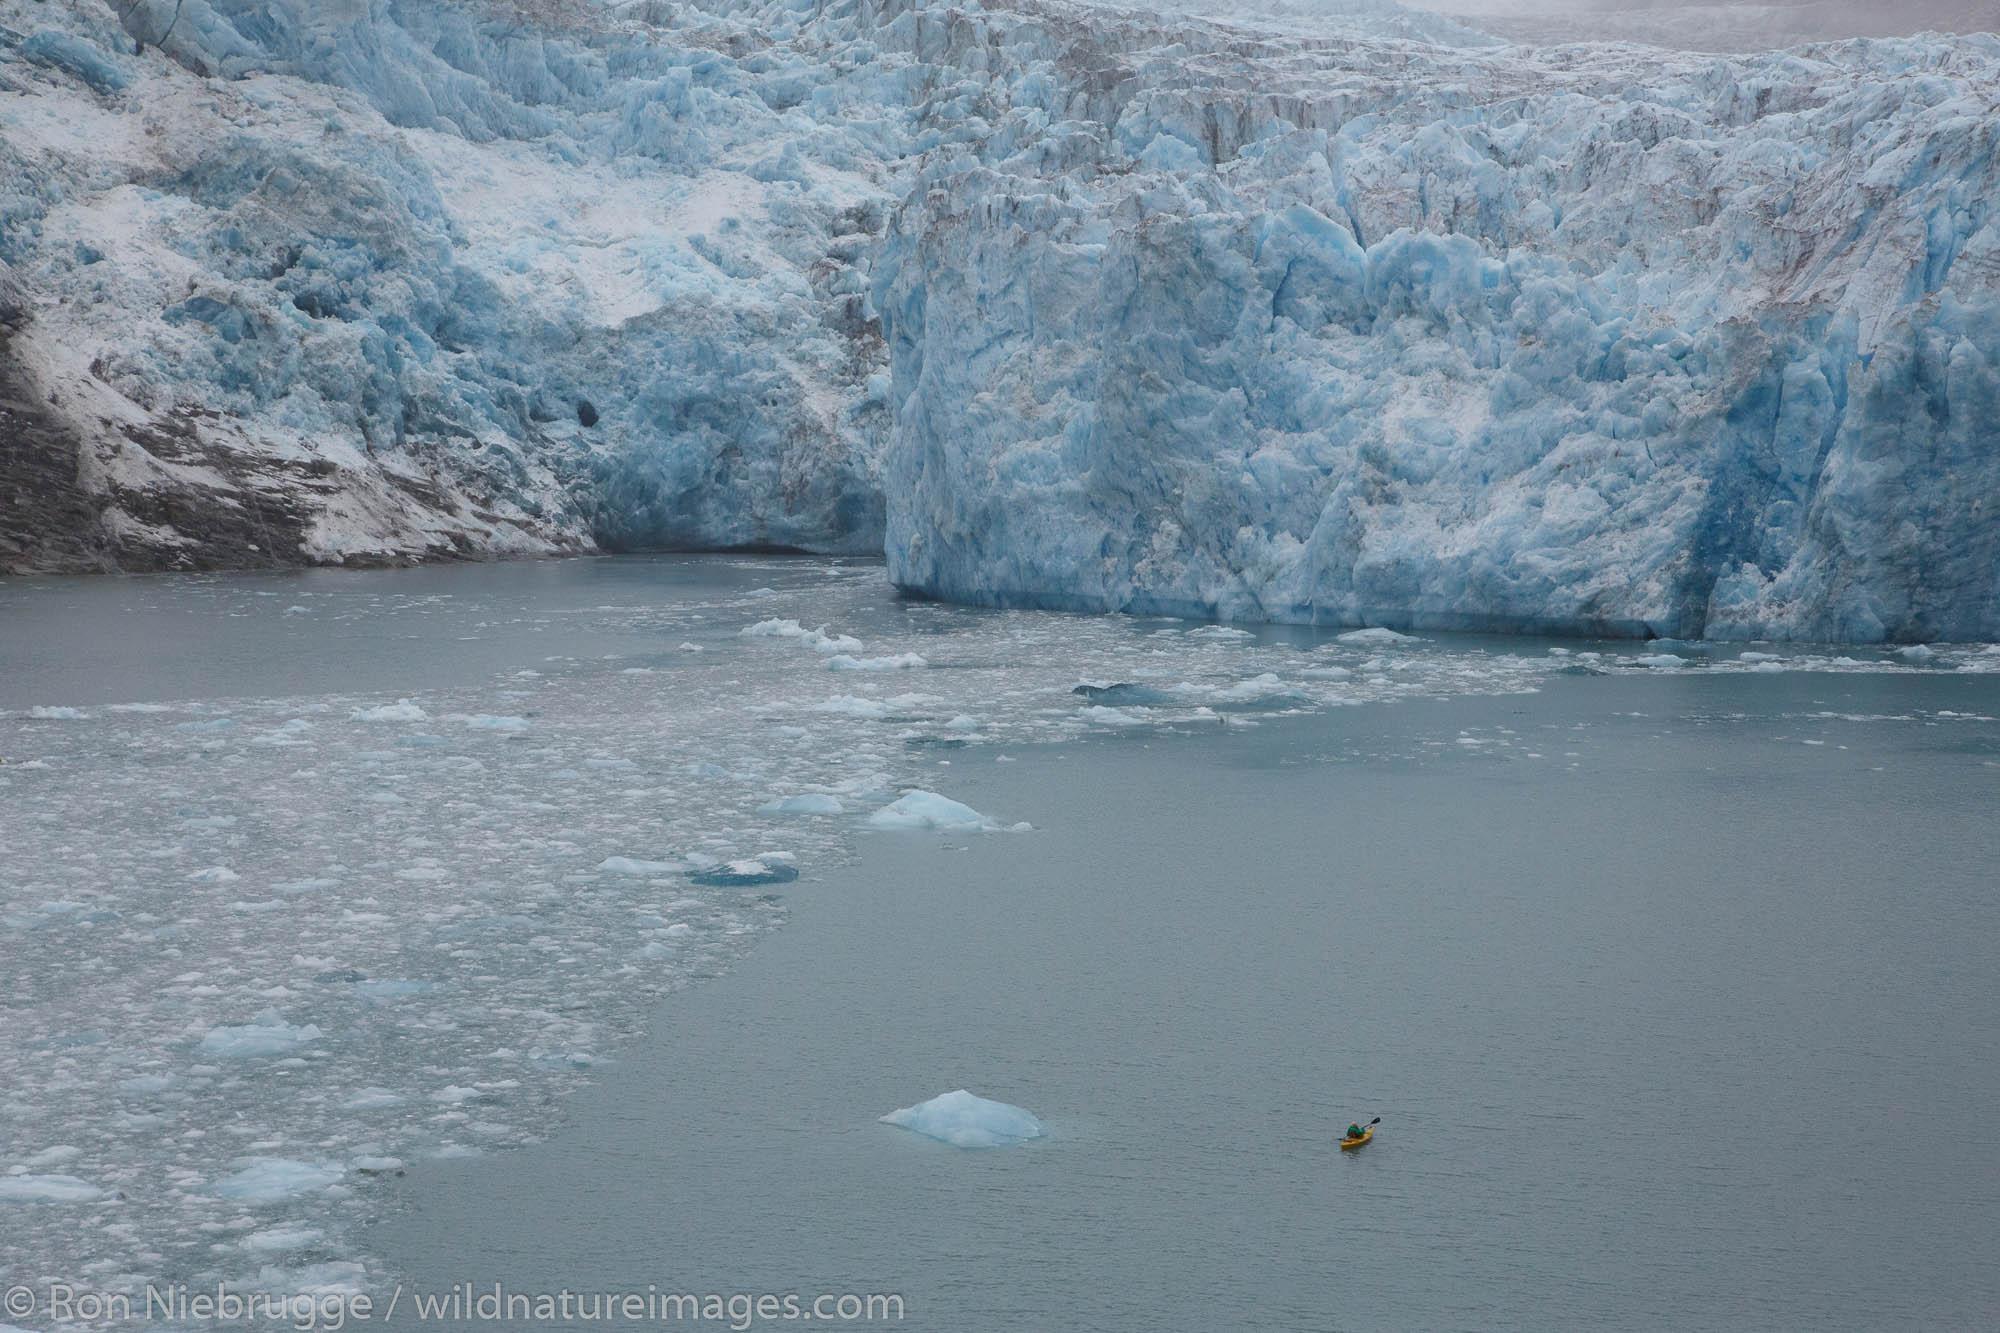 Kayaking in Prince William Sound, Chugach National Forest, Alaska.